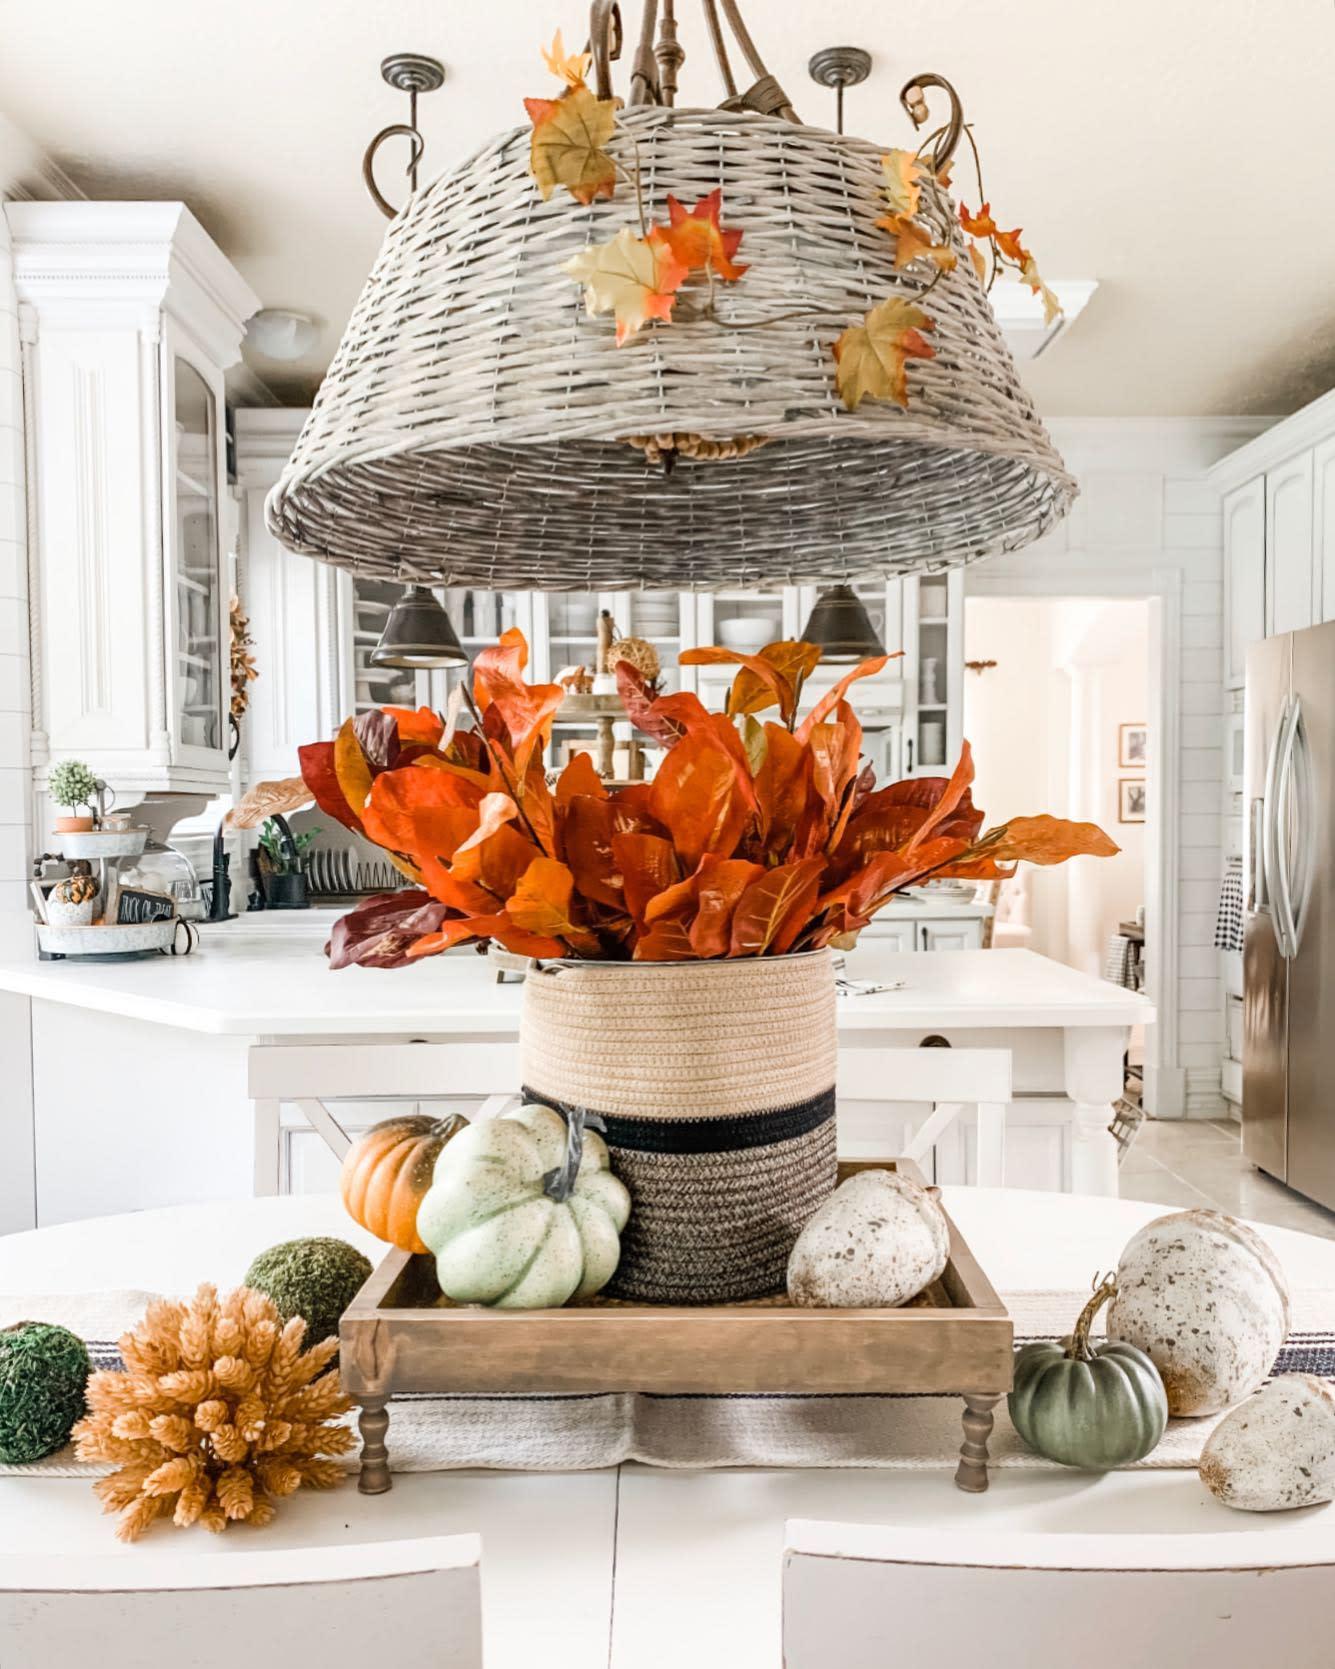 elegant-fall-decorating-ideas-amywilsondesigns